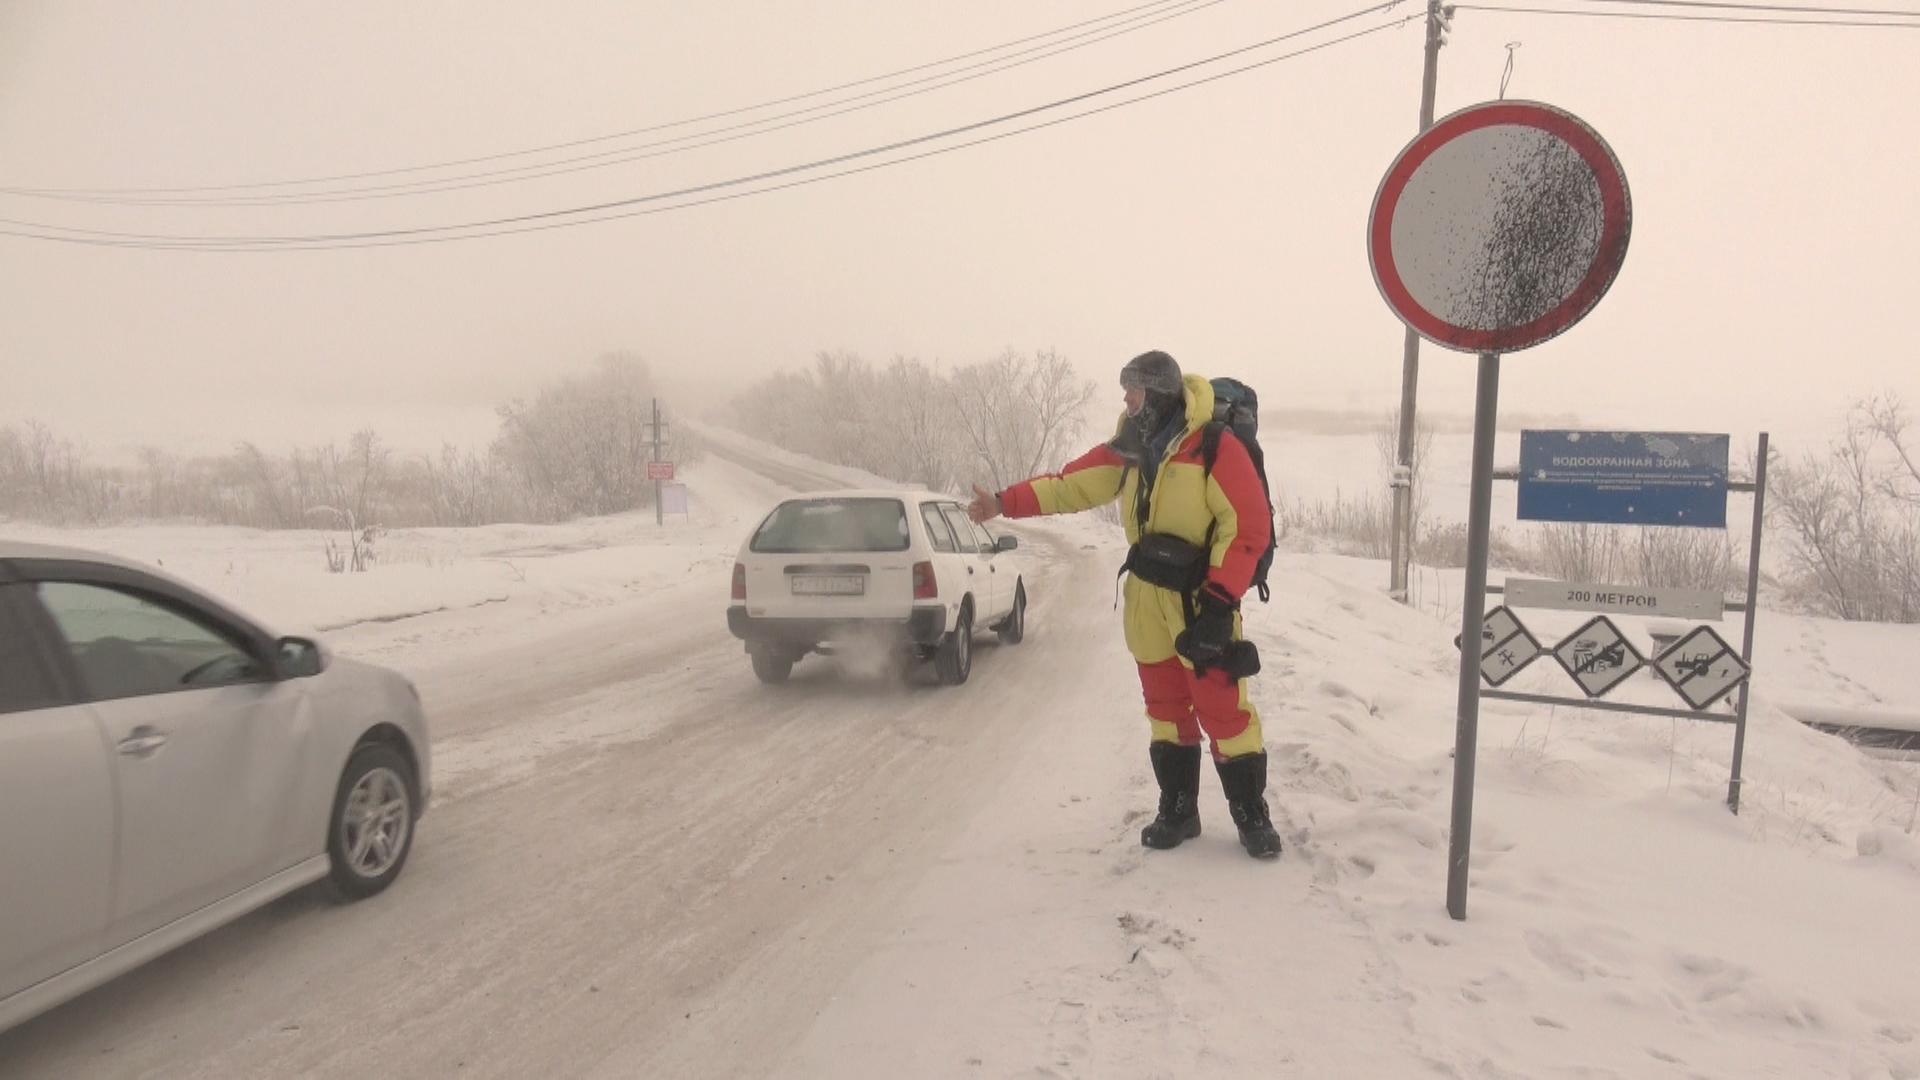 Autostopp bei -40 Grad